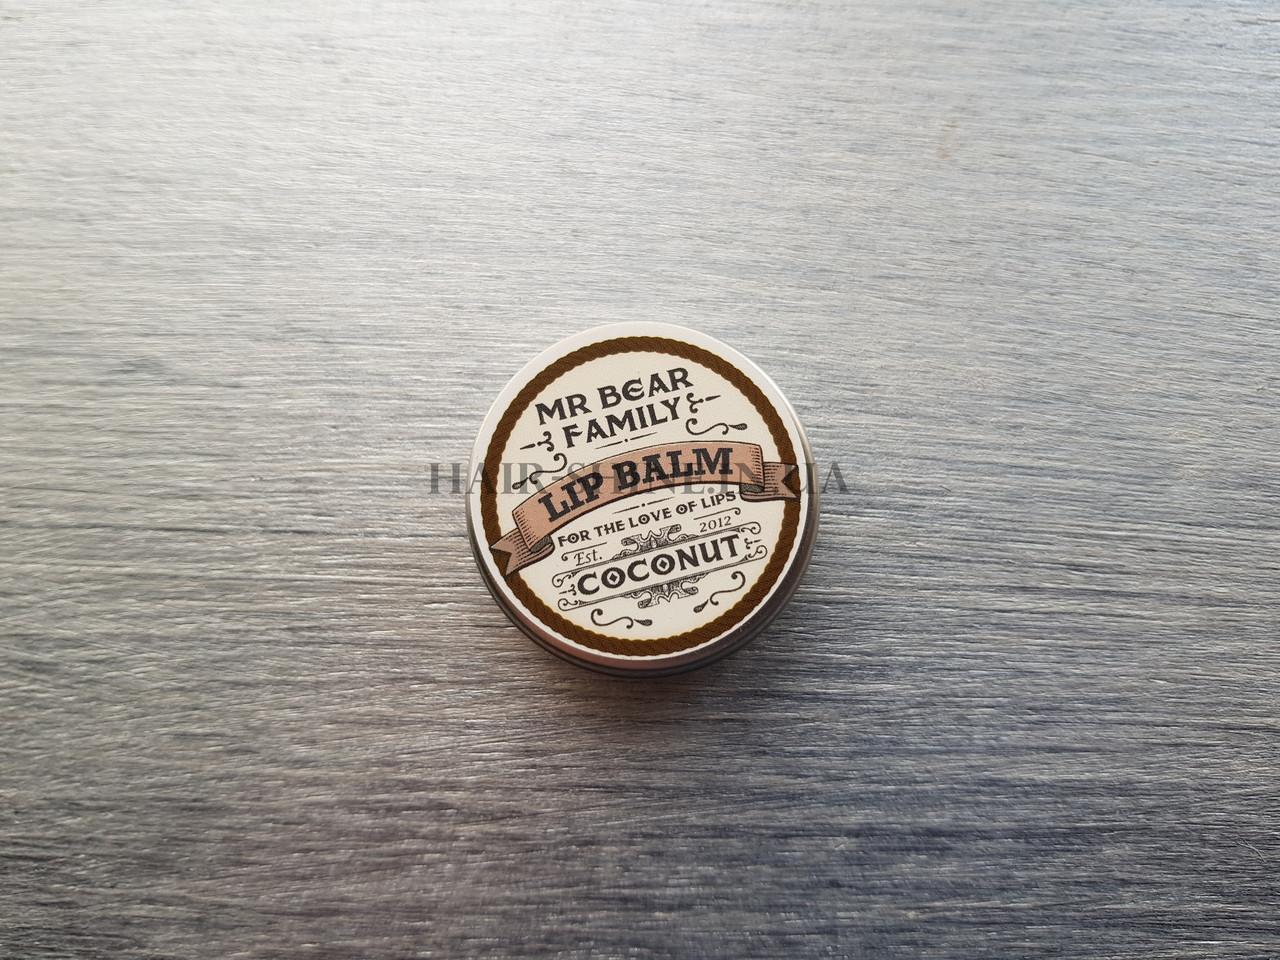 Бальзам для губ Mr. Bear Family Lip Balm Coconut